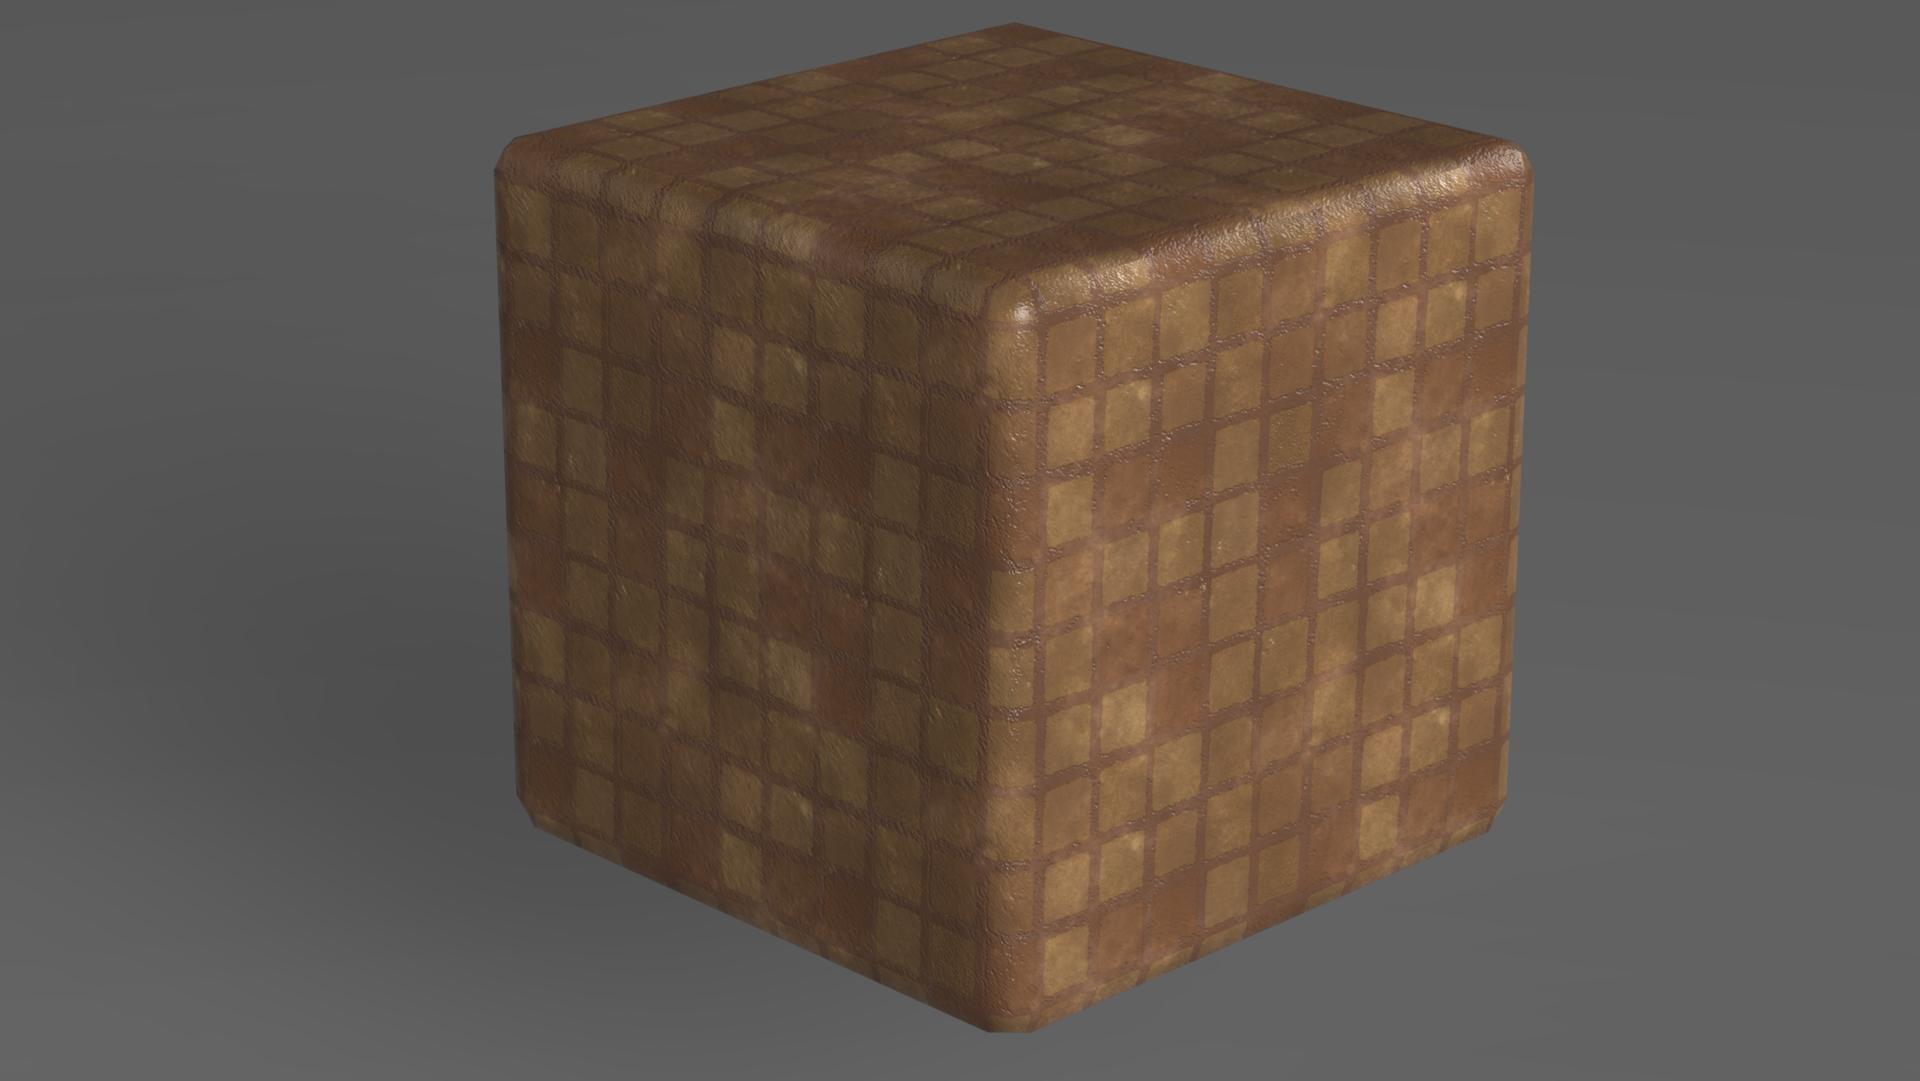 Brick_02.png